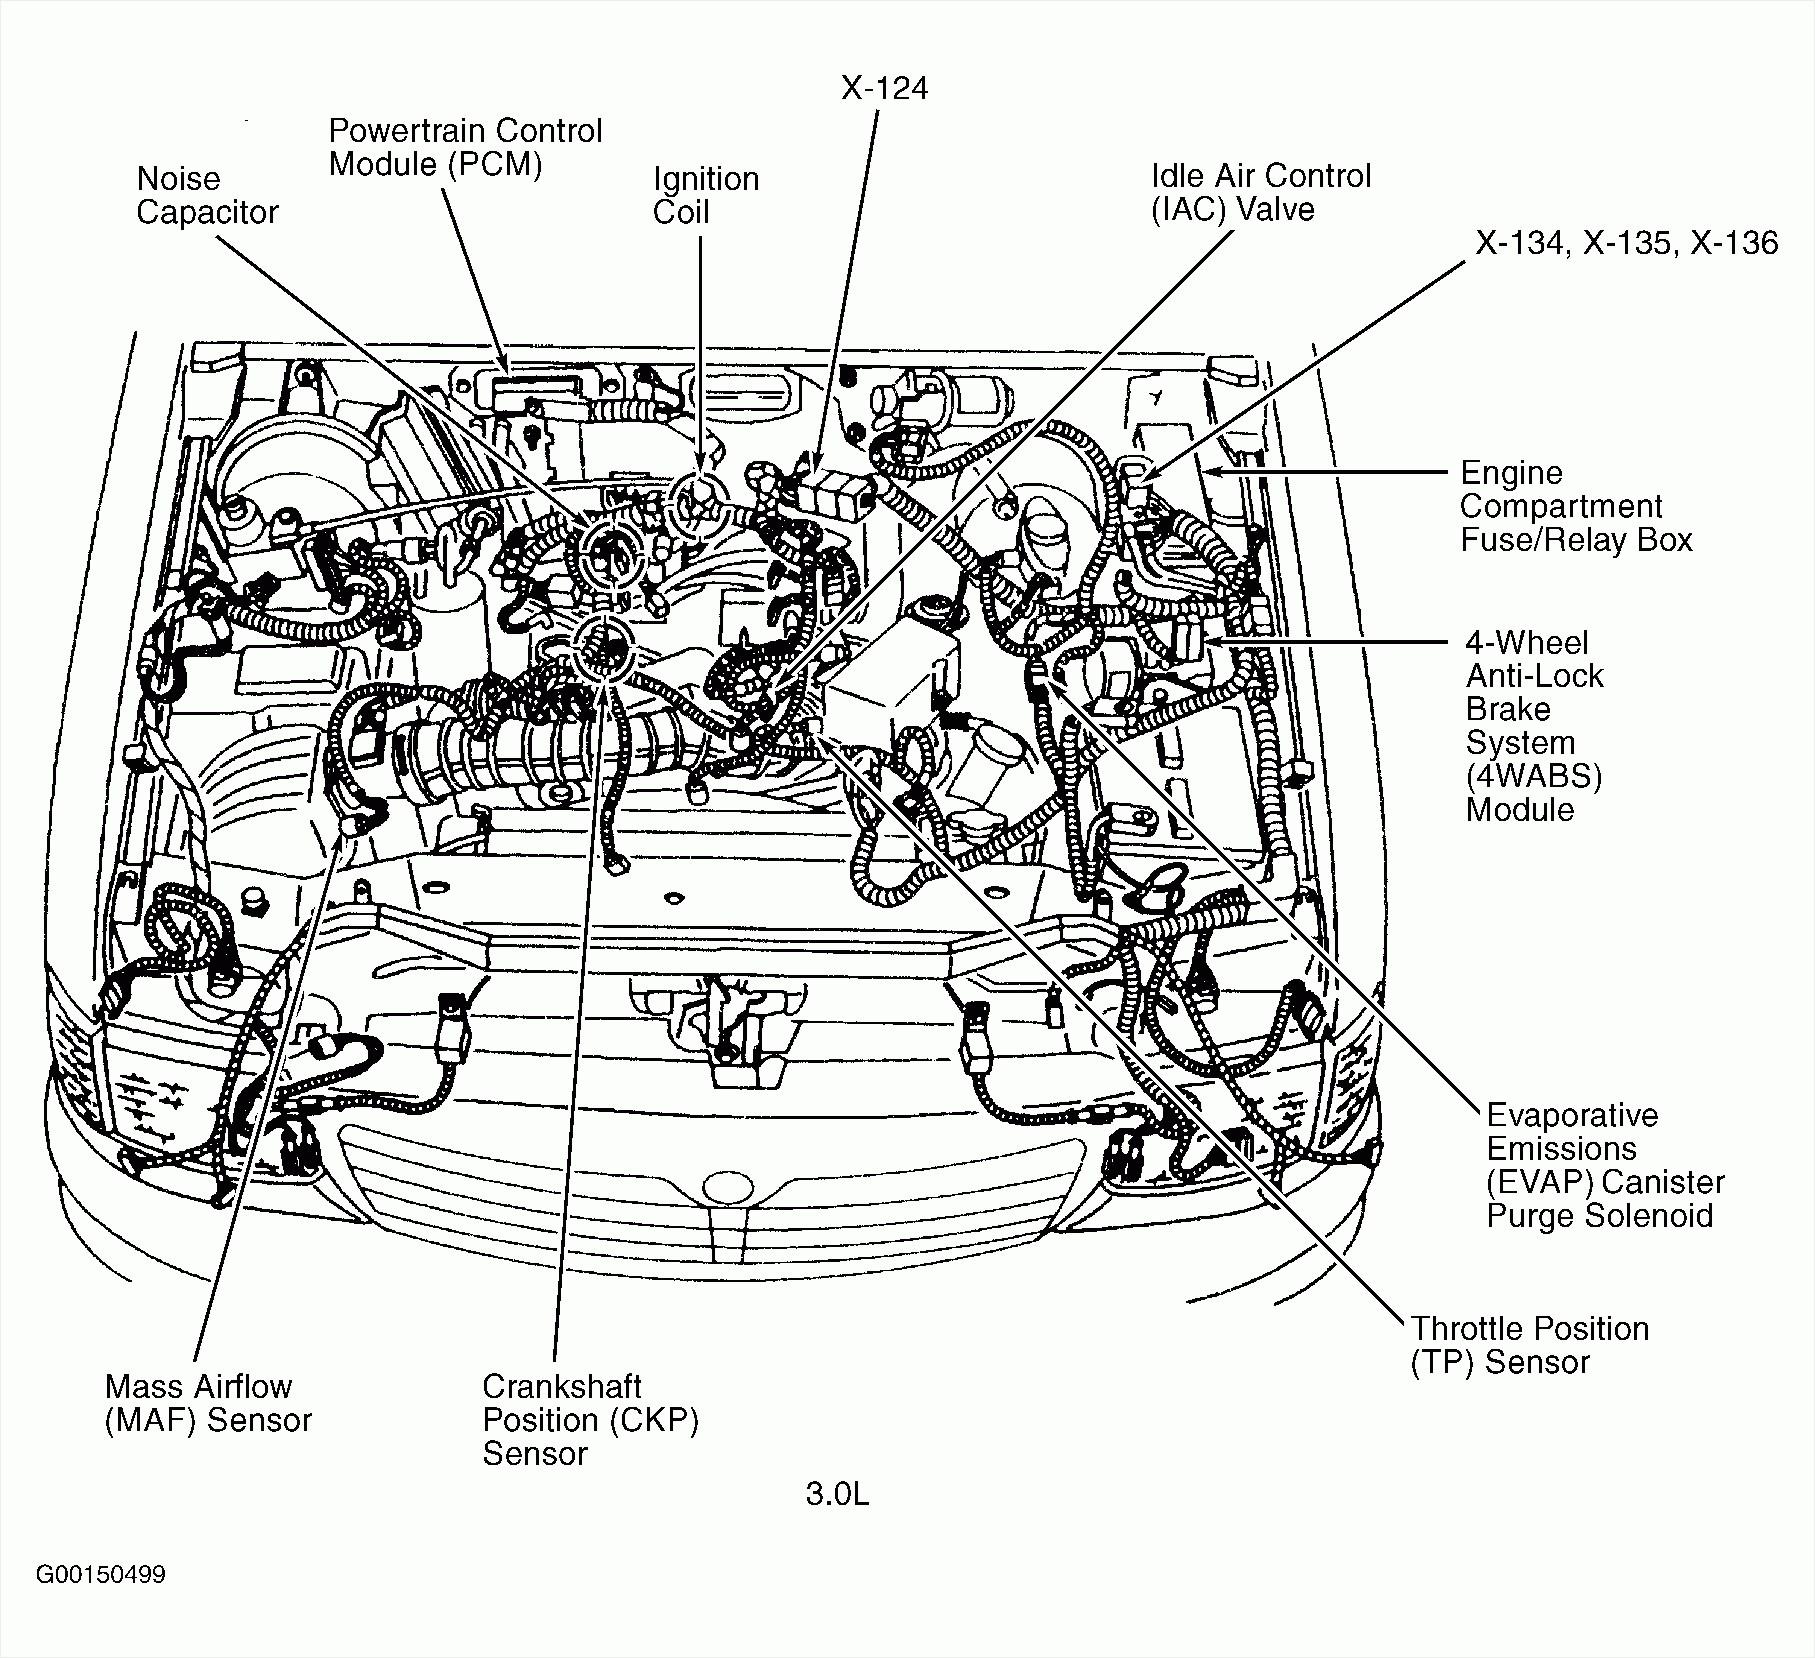 1999 Suzuki Grand Vitara Engine Diagram - top electrical ... on main fuse battery, main panel box, main terminal box, main breaker box, main breaker panel, main electrical box, main circuit box, circuit breaker box, light box, main disconnect switch, main circuit breaker, main fuse house, motor box, generator box, heater box,